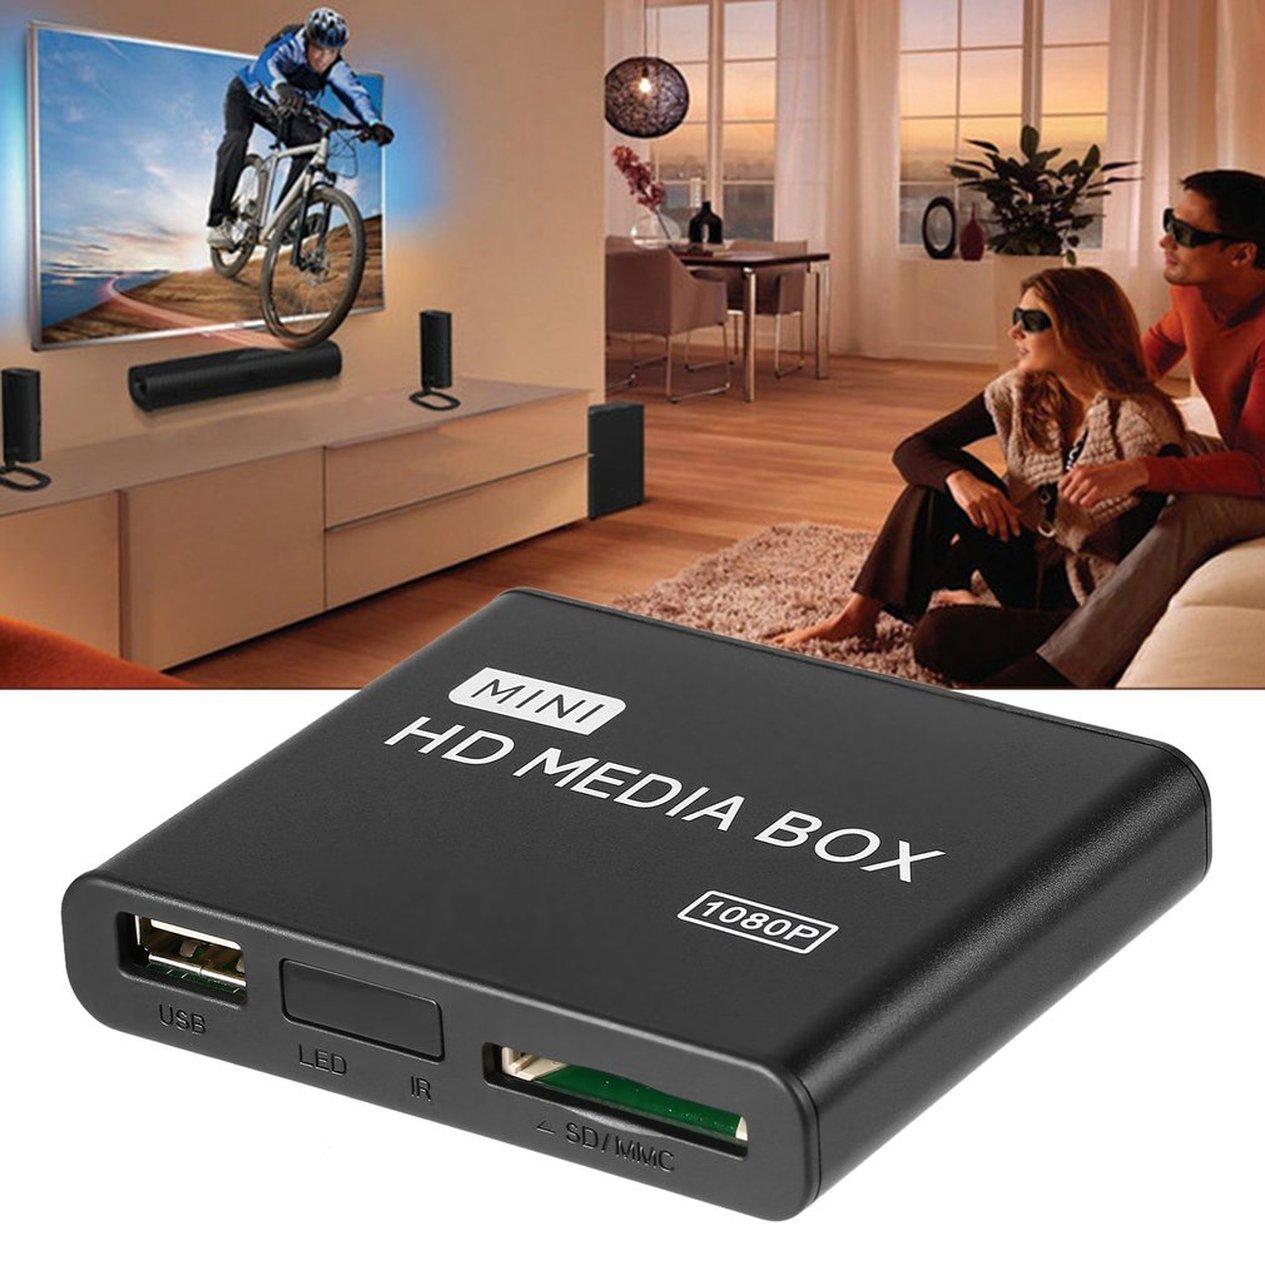 HD Media Player Box Mini Full 1080p MPEG//MKV//H.264 HDMI AV USB Supporto remoto MKV//RM-SD//USB//SDHC//MMC HDD-HDMI